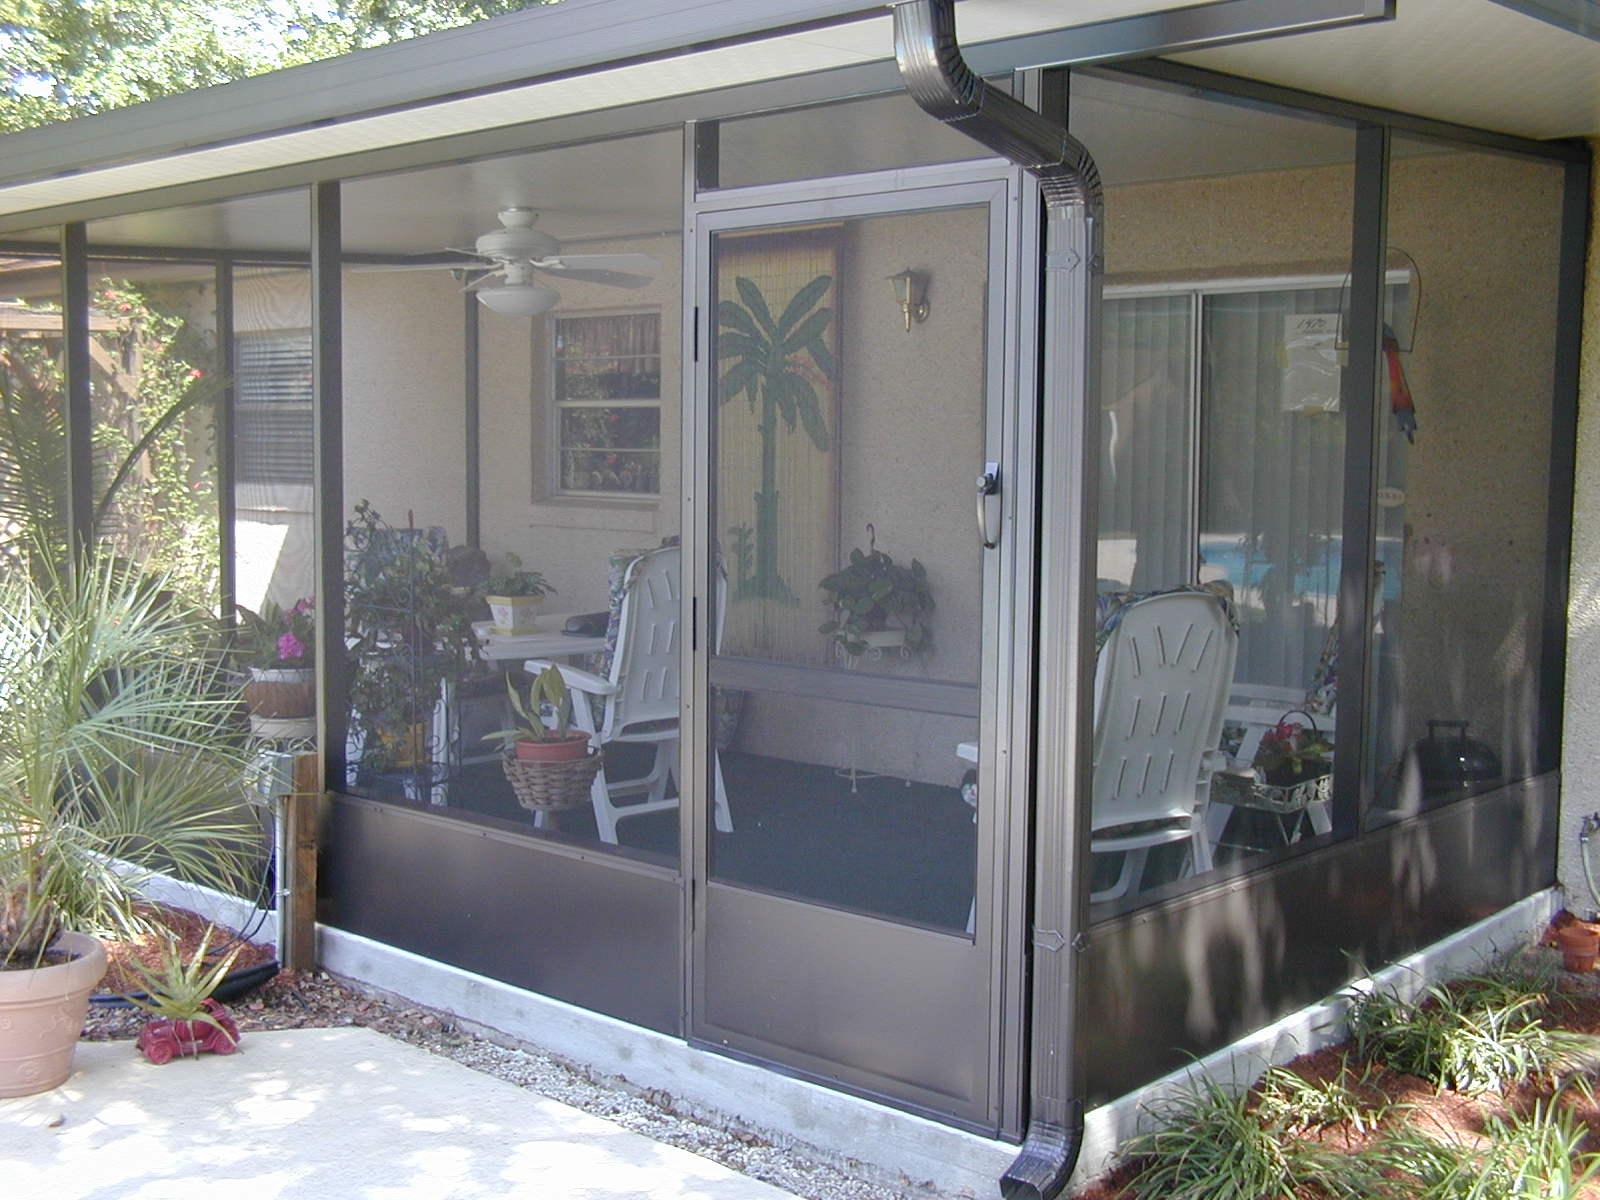 Aluminum room made by kwikscreen